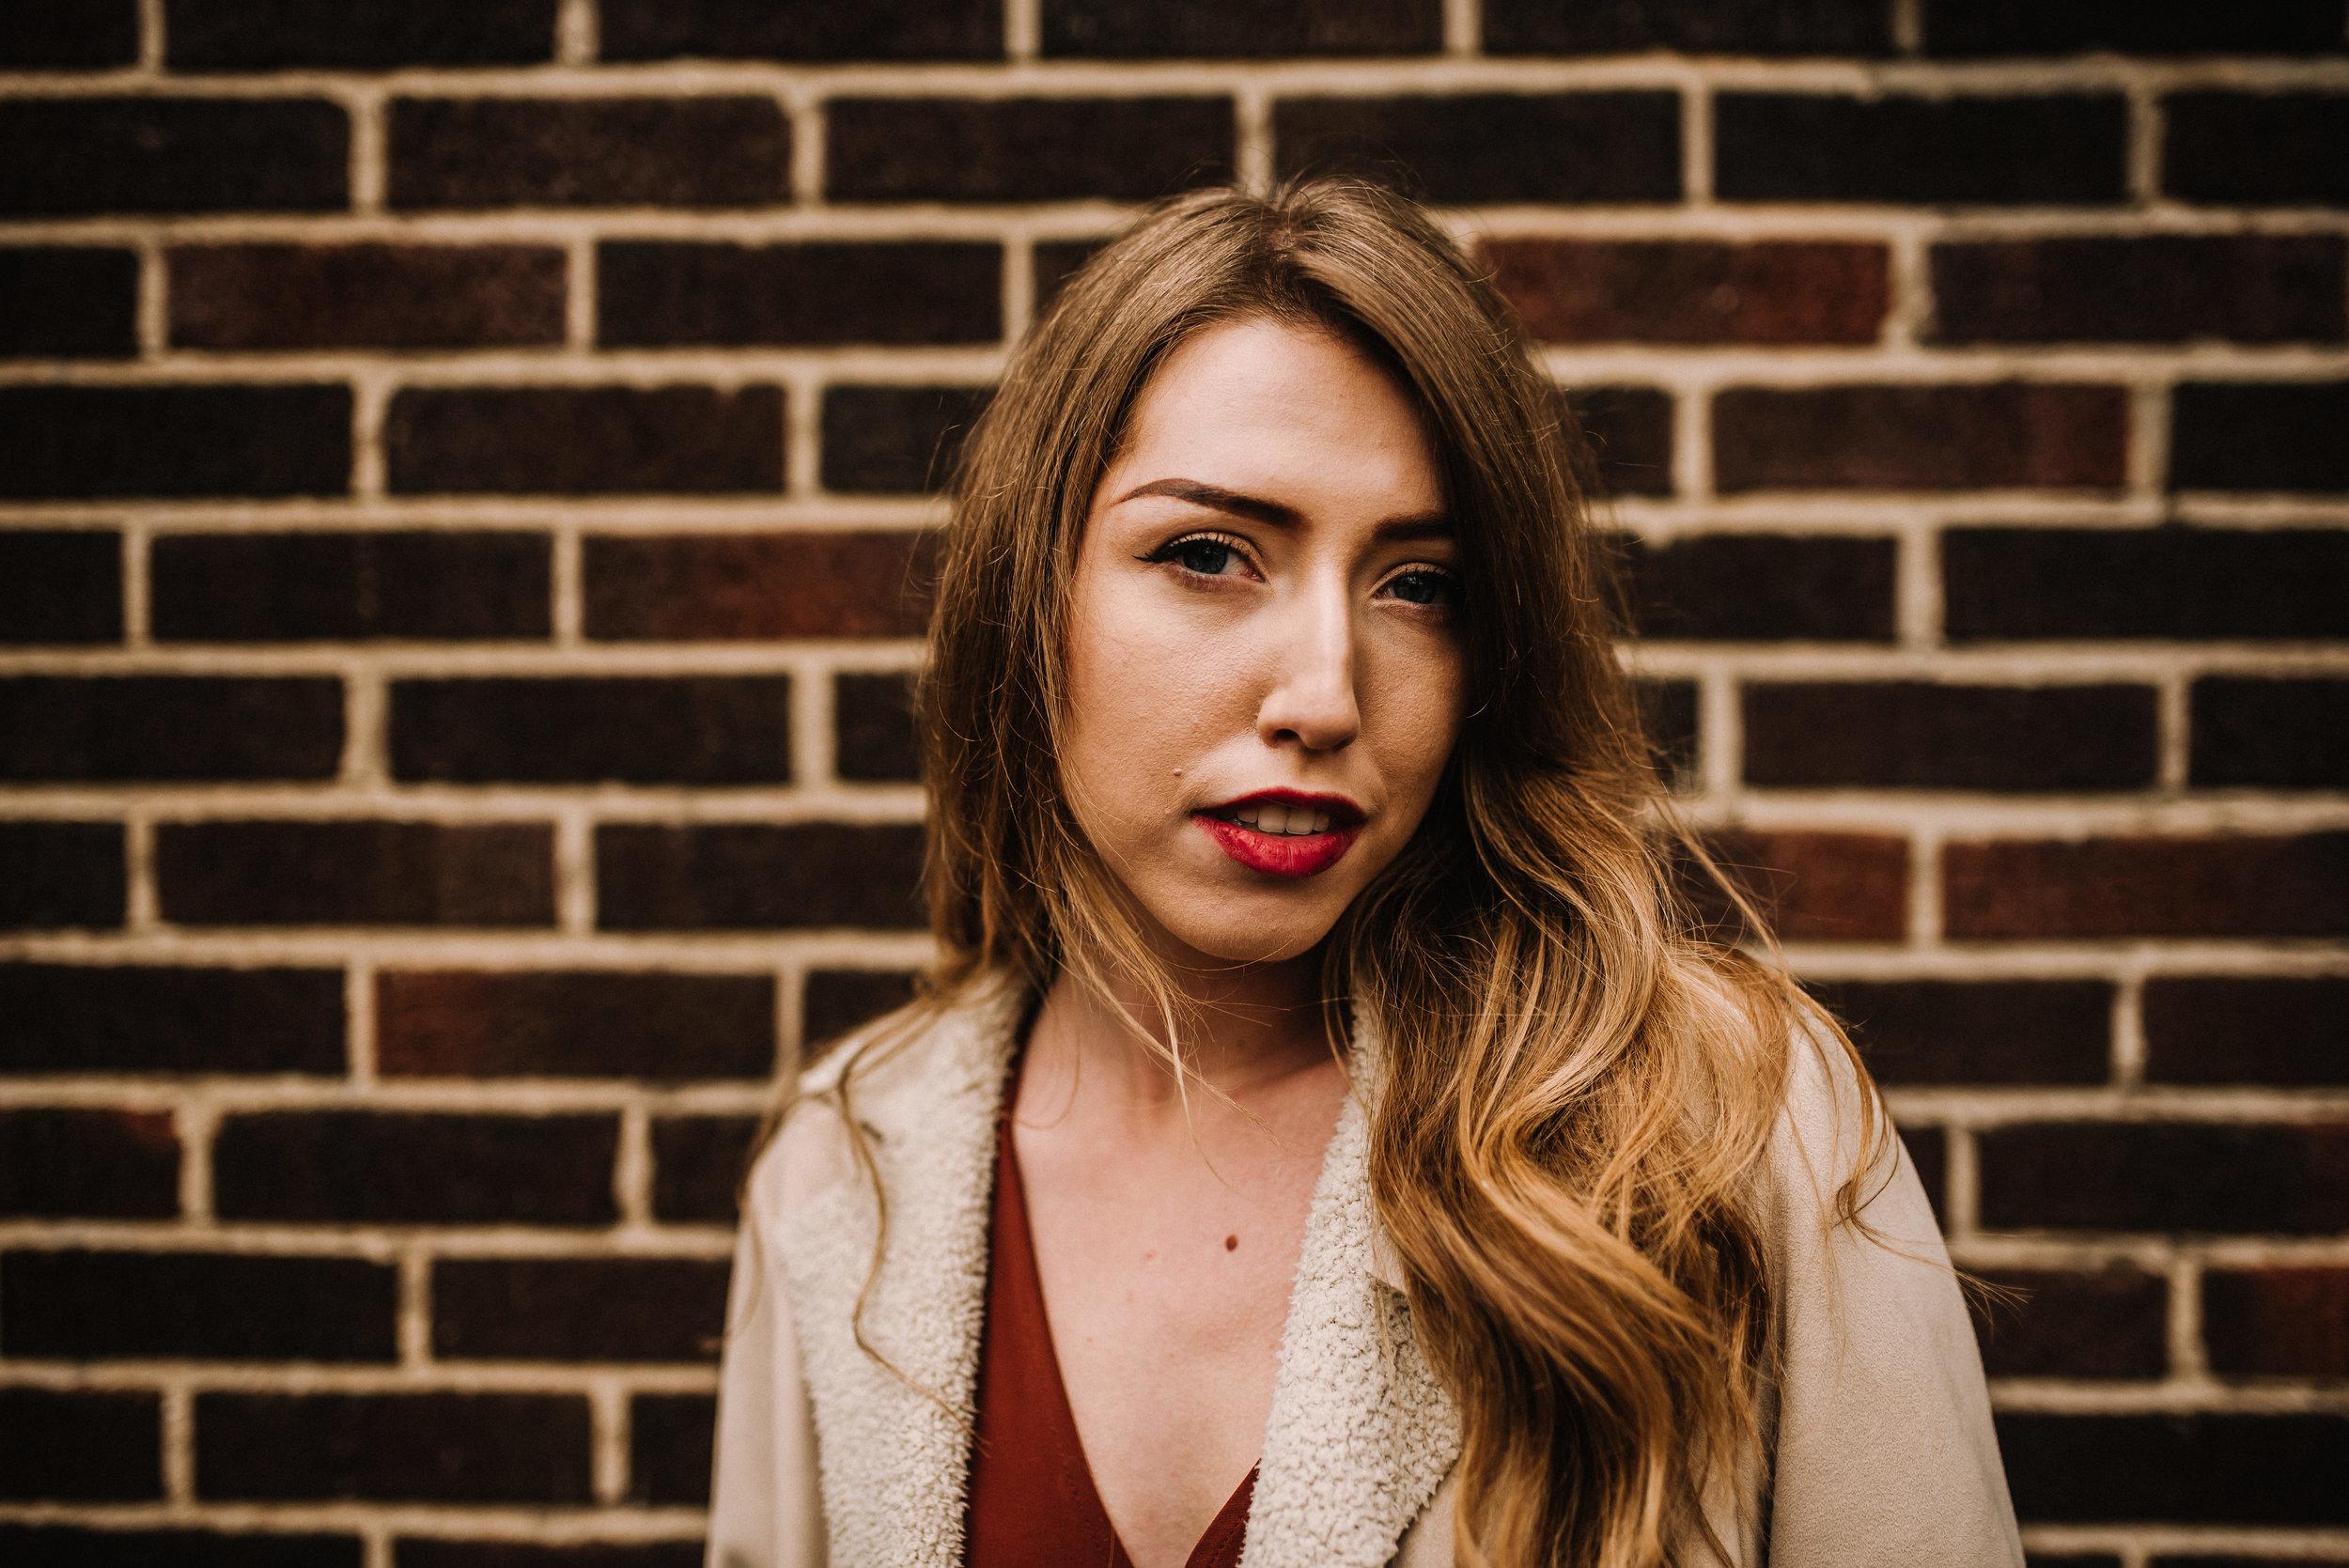 Kaitlyn_Ashley-Benham-Photography-37.jpg